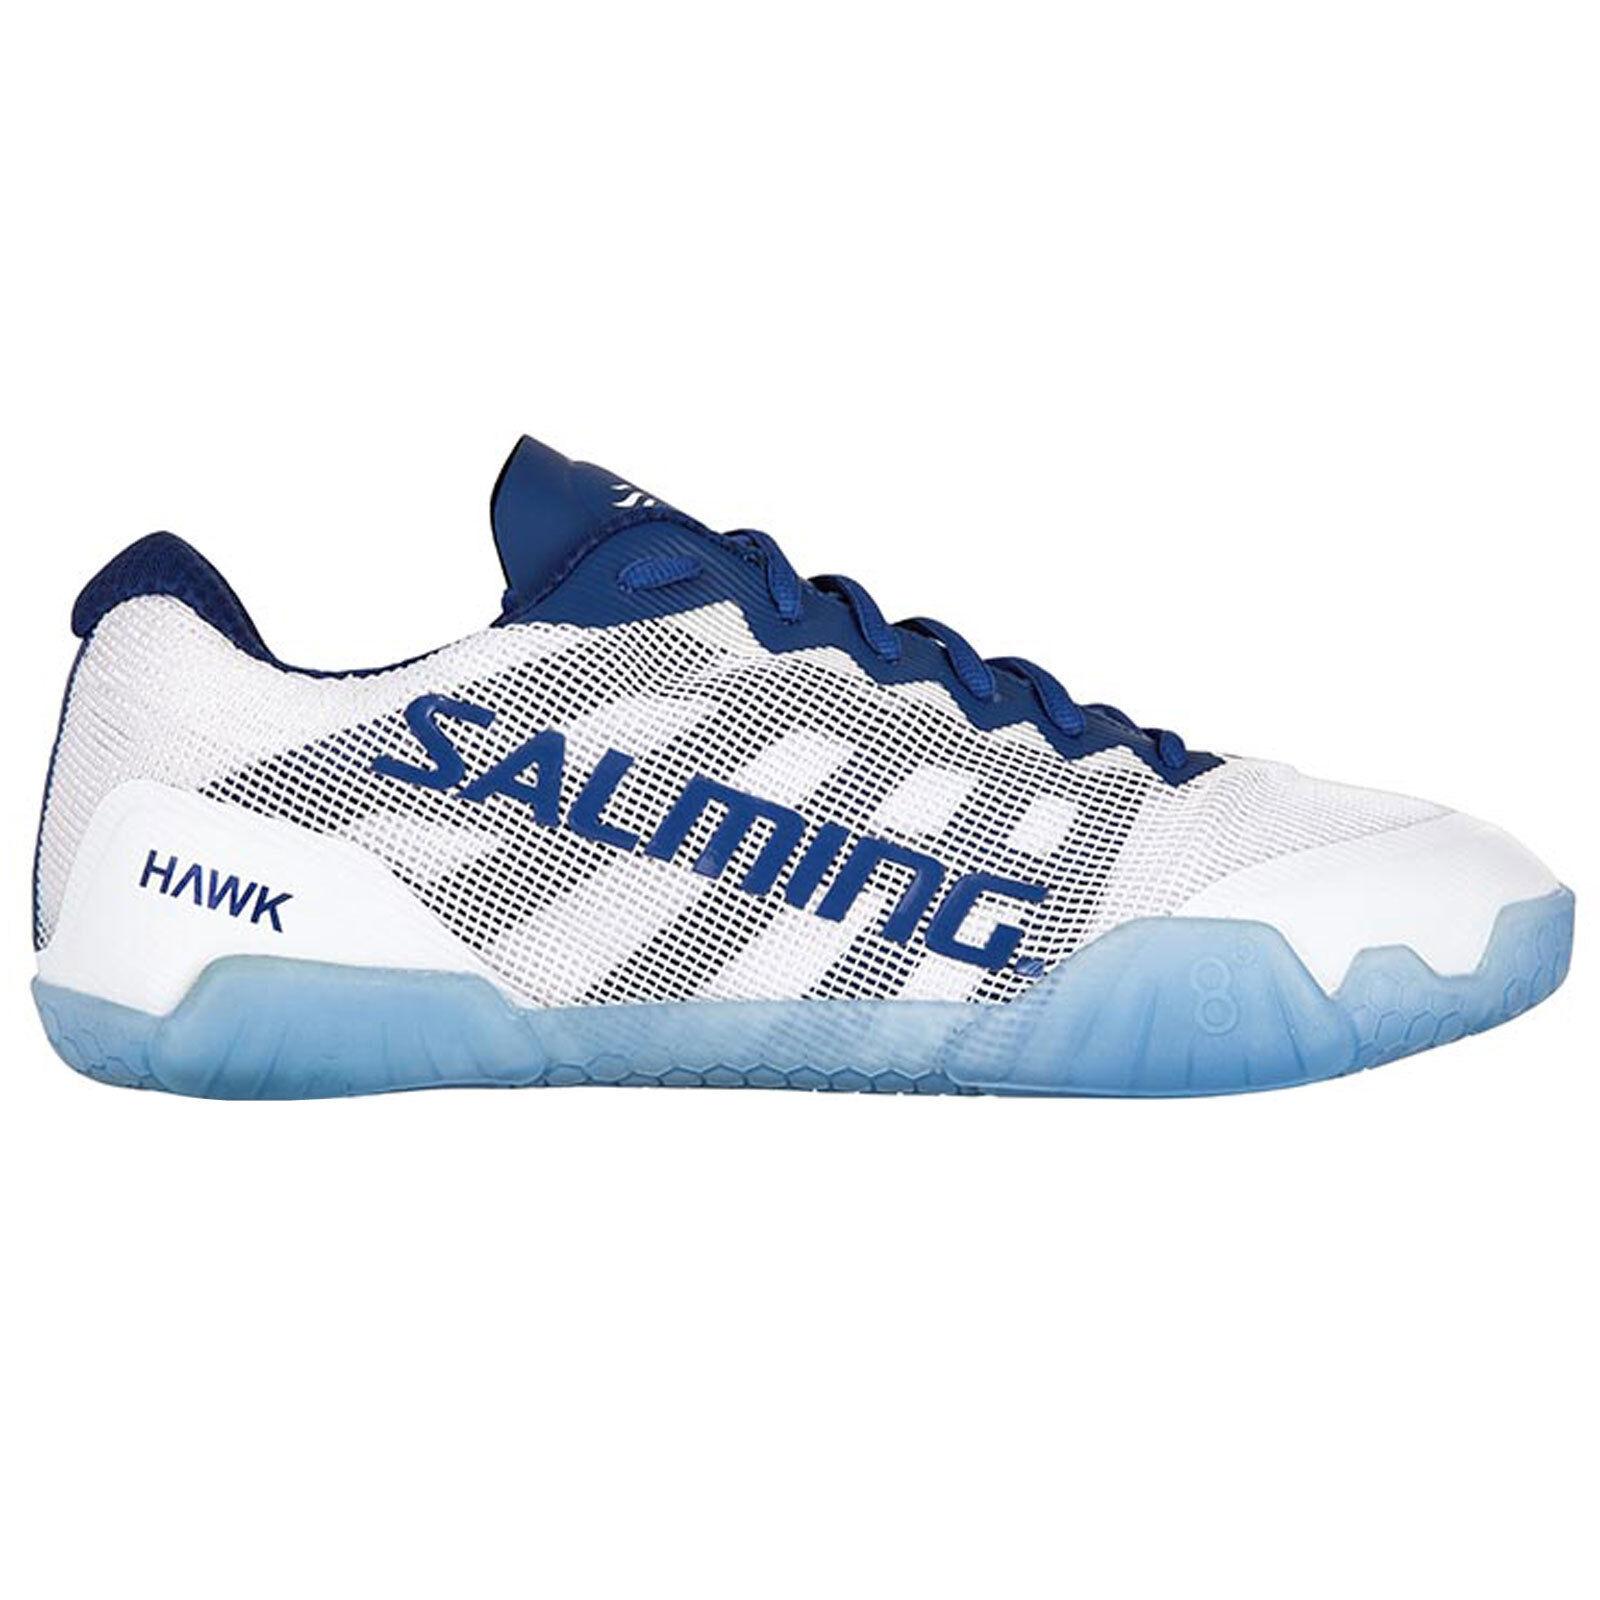 Salming Hawk 2018 Frauen Handballschuhe Handballschuhe Handballschuhe Indoorschuhe Weiss Blau 1238086 0704 2d5aff